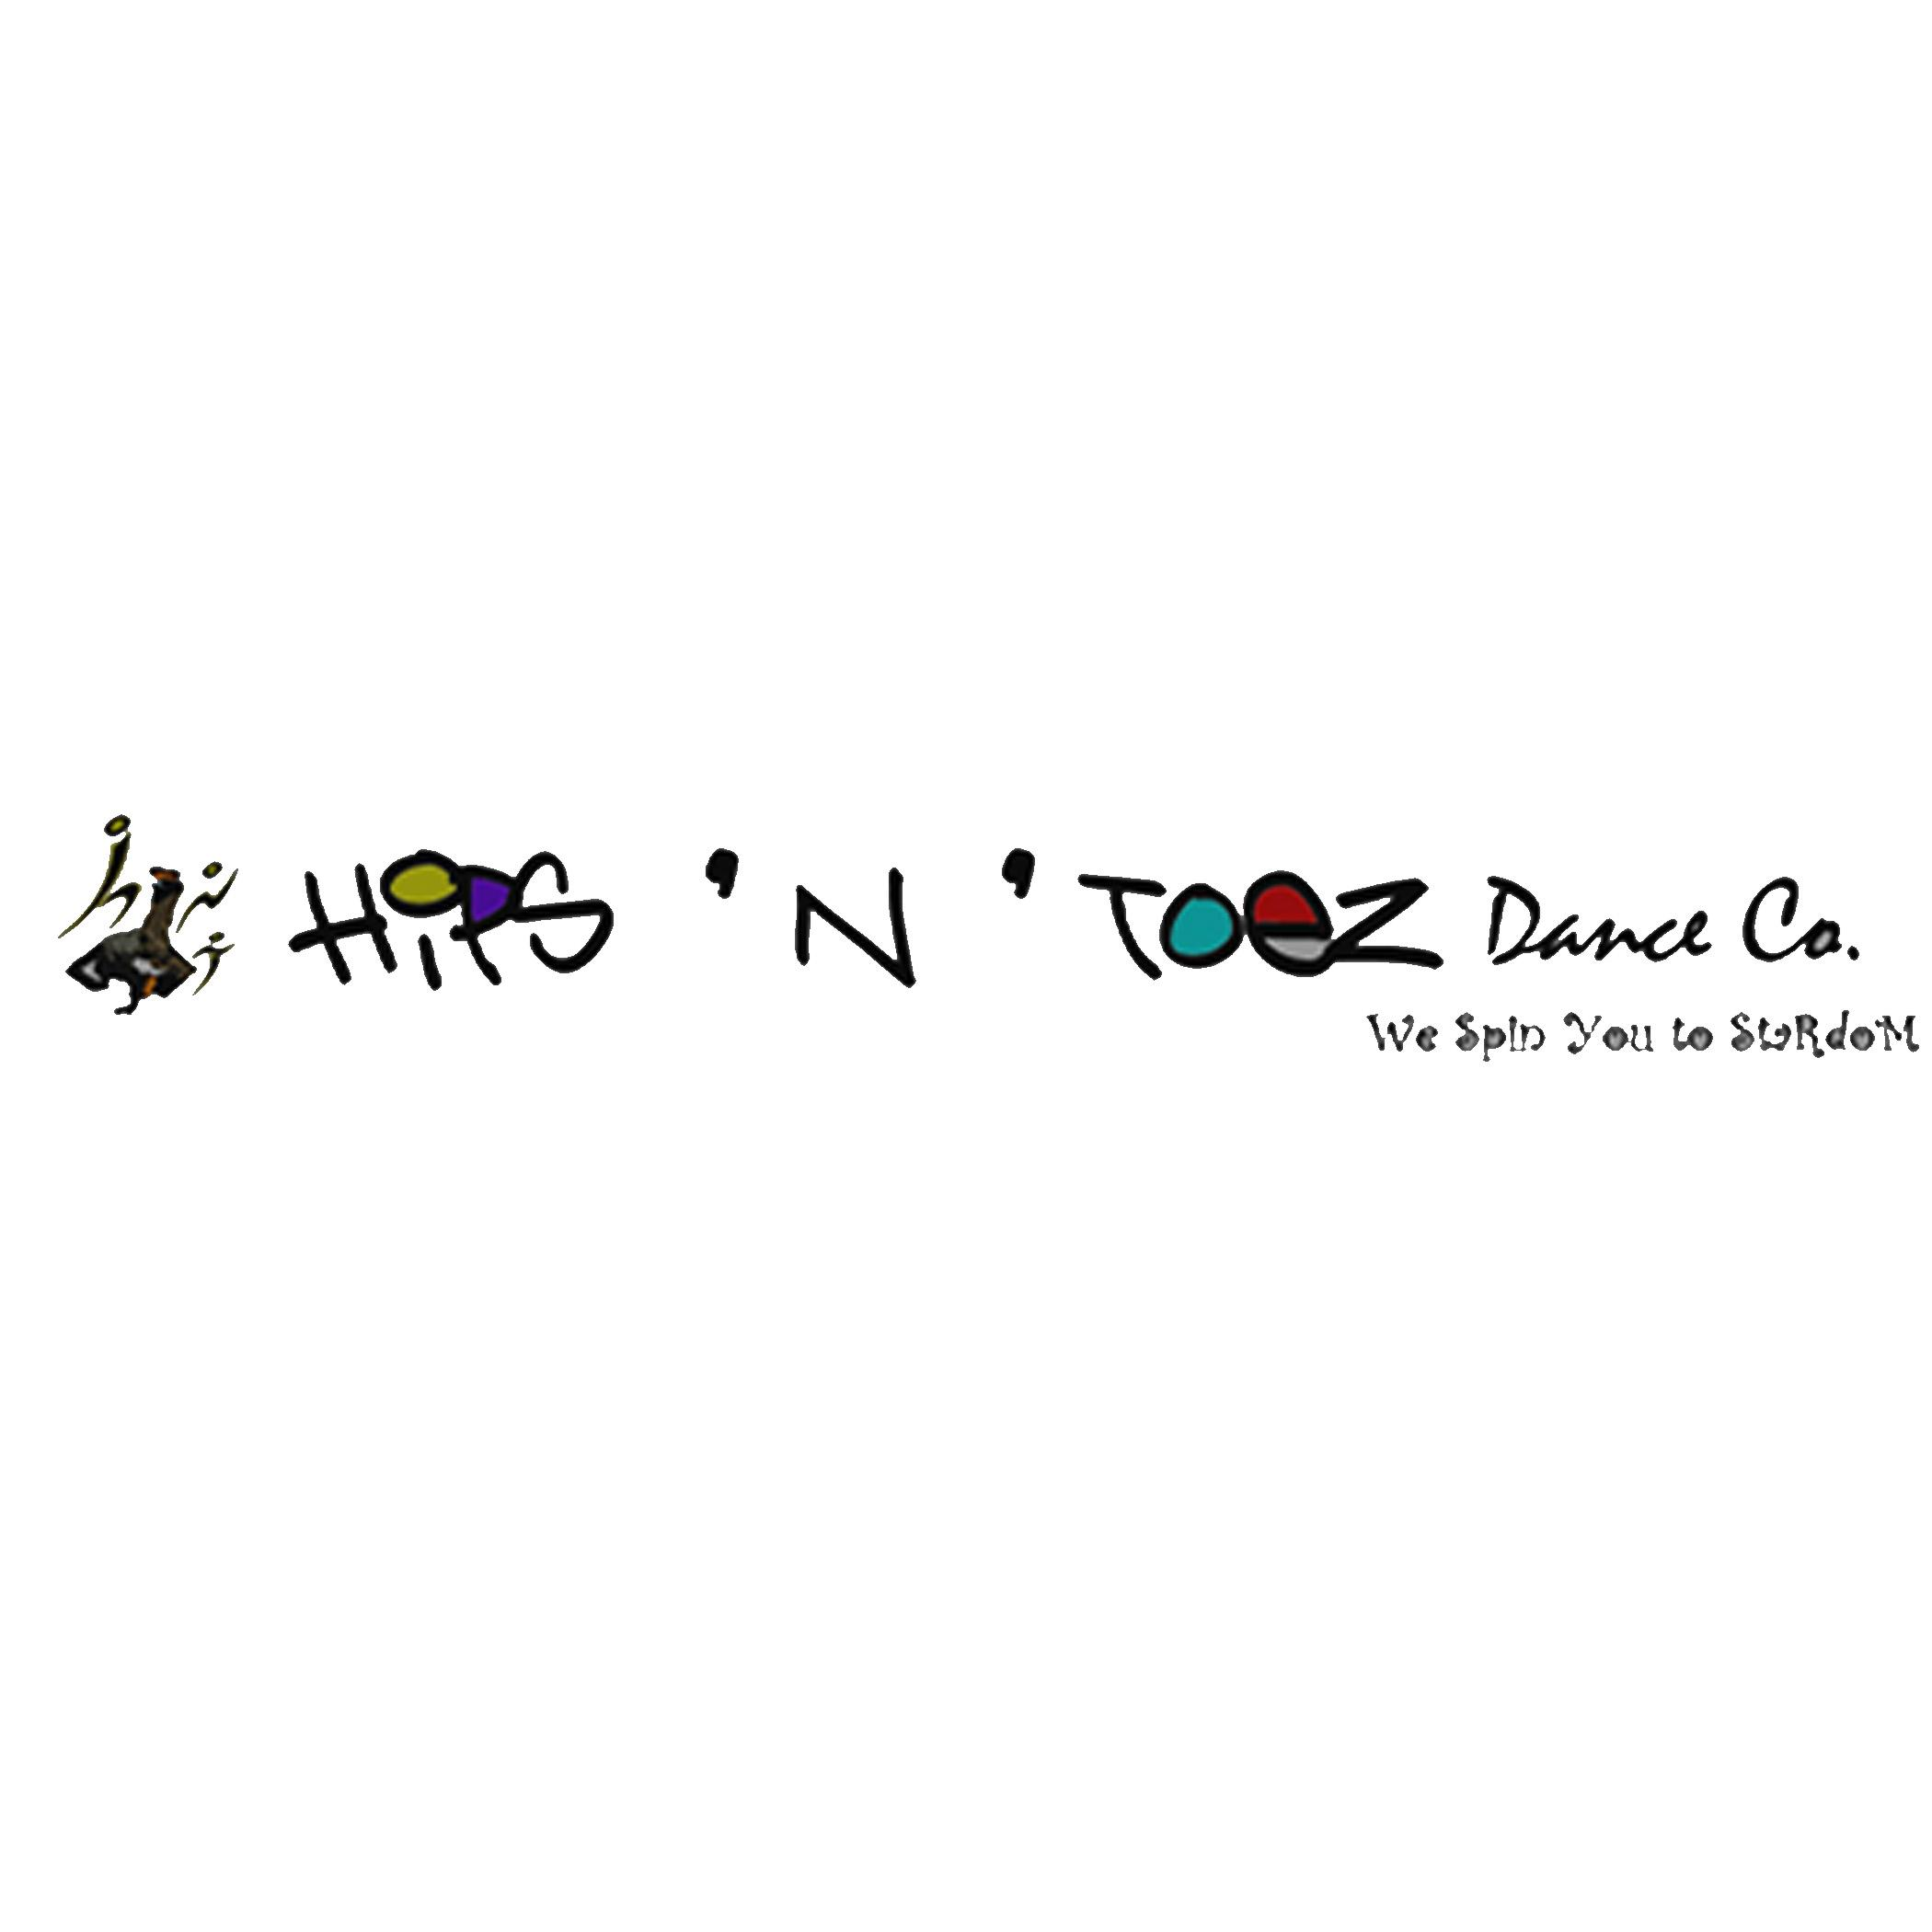 Hips 'N' Toez Dance Co, Hips 'N' Toez Dance Co